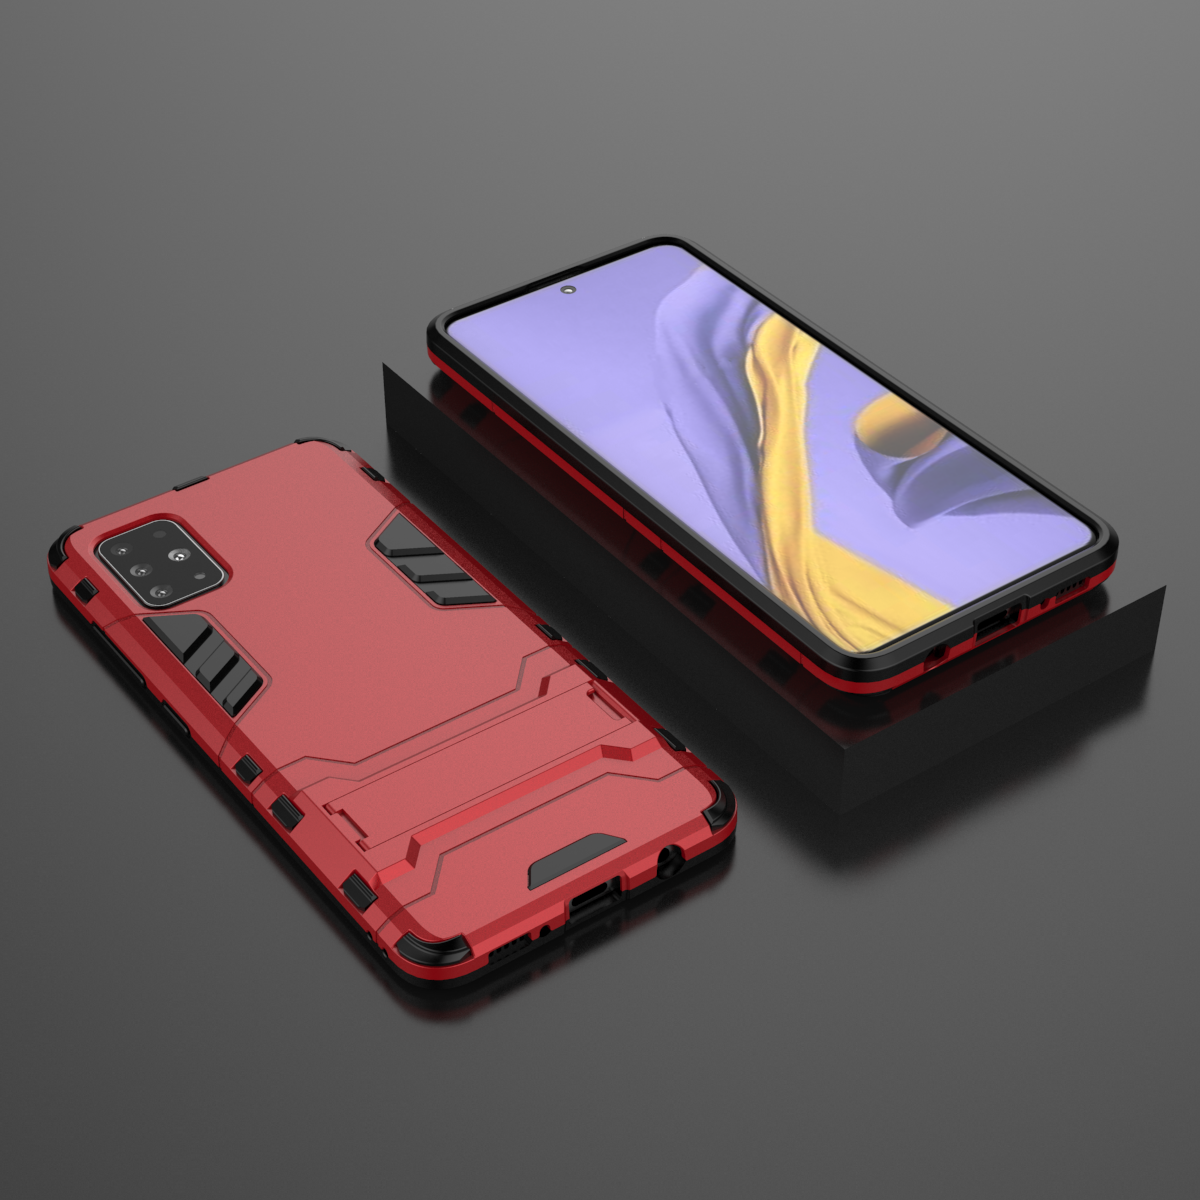 Shockproof Case For Samsung Galaxy A71 A51 A10 A30 A70 A60 A50 A40 S A80 A90 5G Cover Armor Cases For Samsung A 51 30 2019 A50S